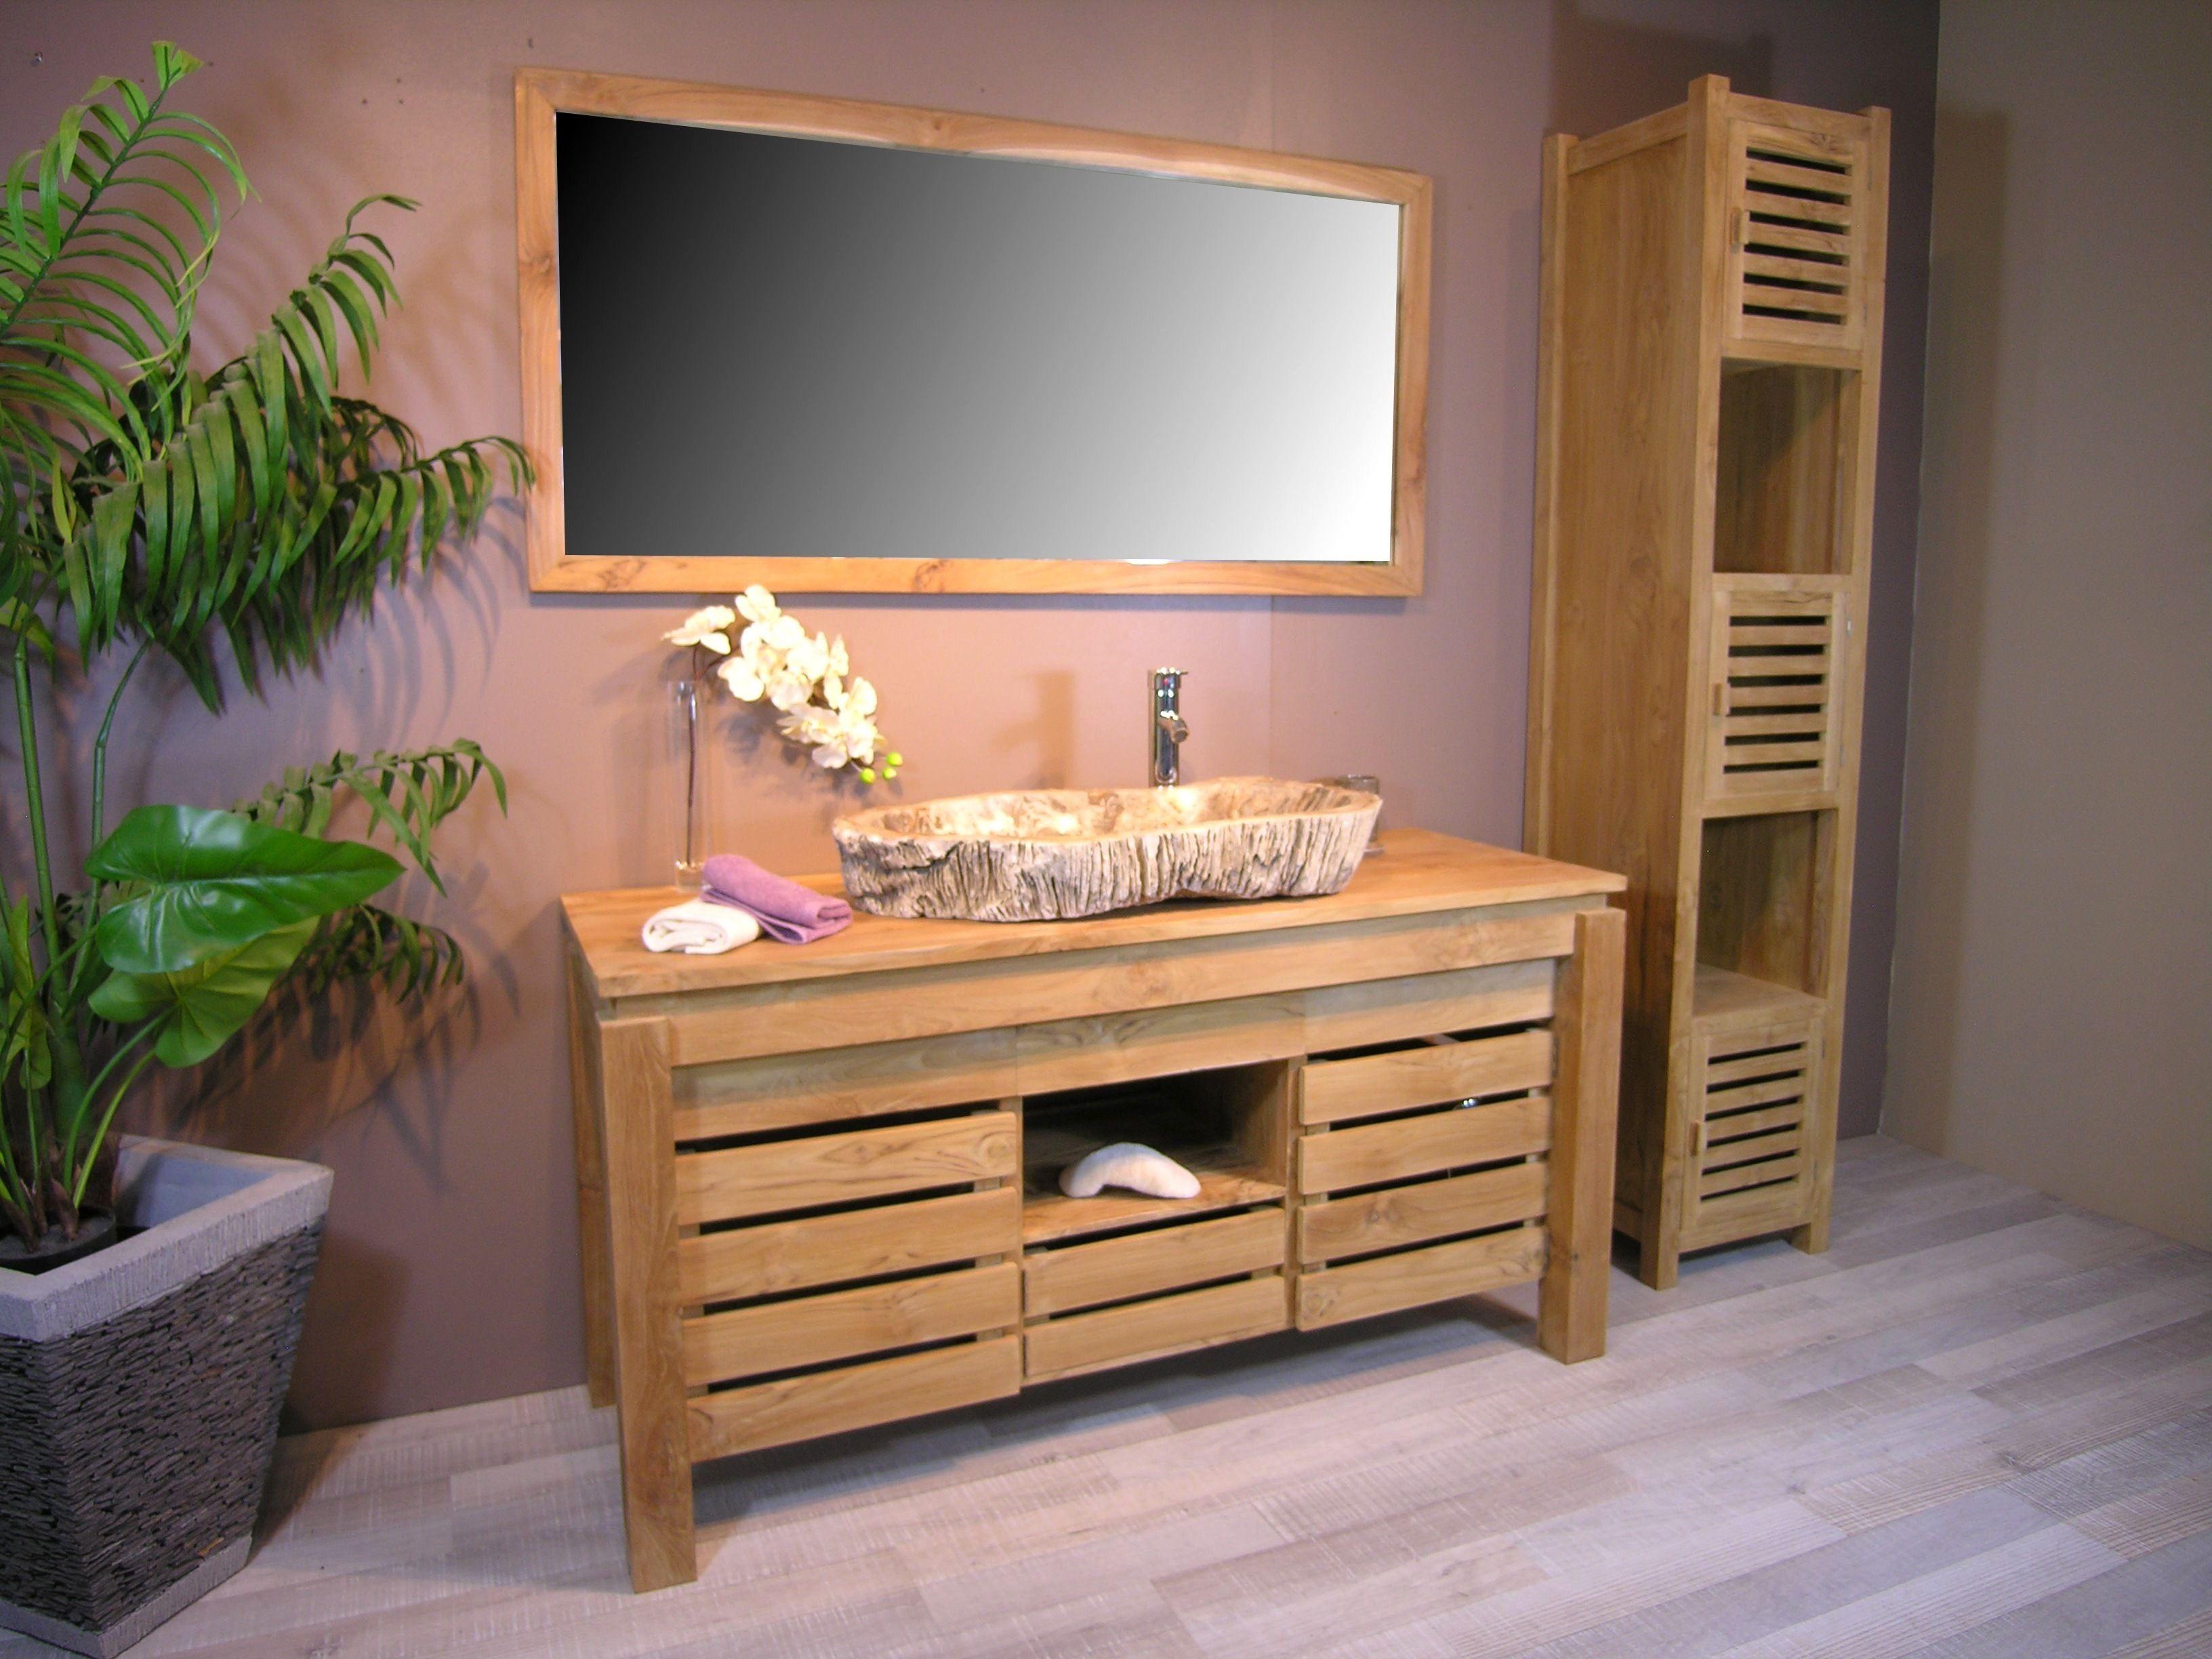 12 Ideal Meuble Palette Salle De Bain Pics Meuble Salle De Bain Salle De Bain Teck Meuble De Salle De Bain